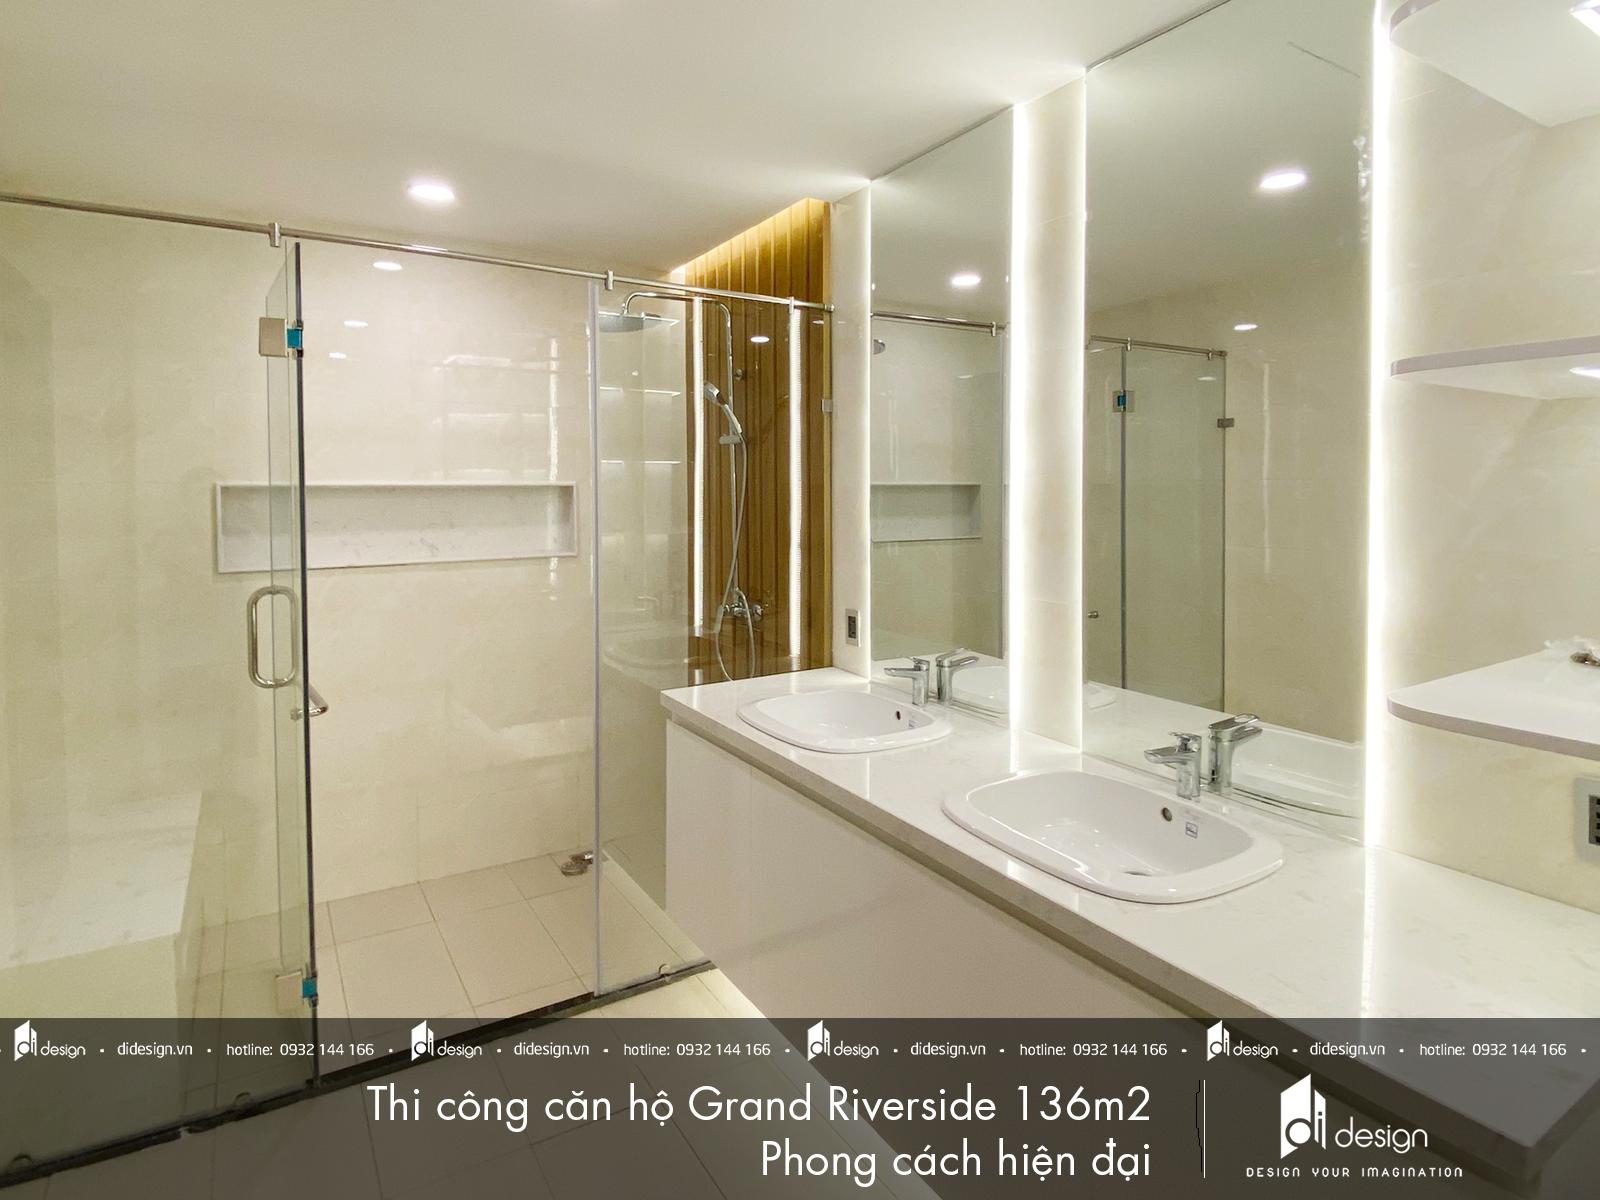 thi-cong-noi-that-can-ho-Grand-Riverside-136m2-9-phong-tam-wc.jpg